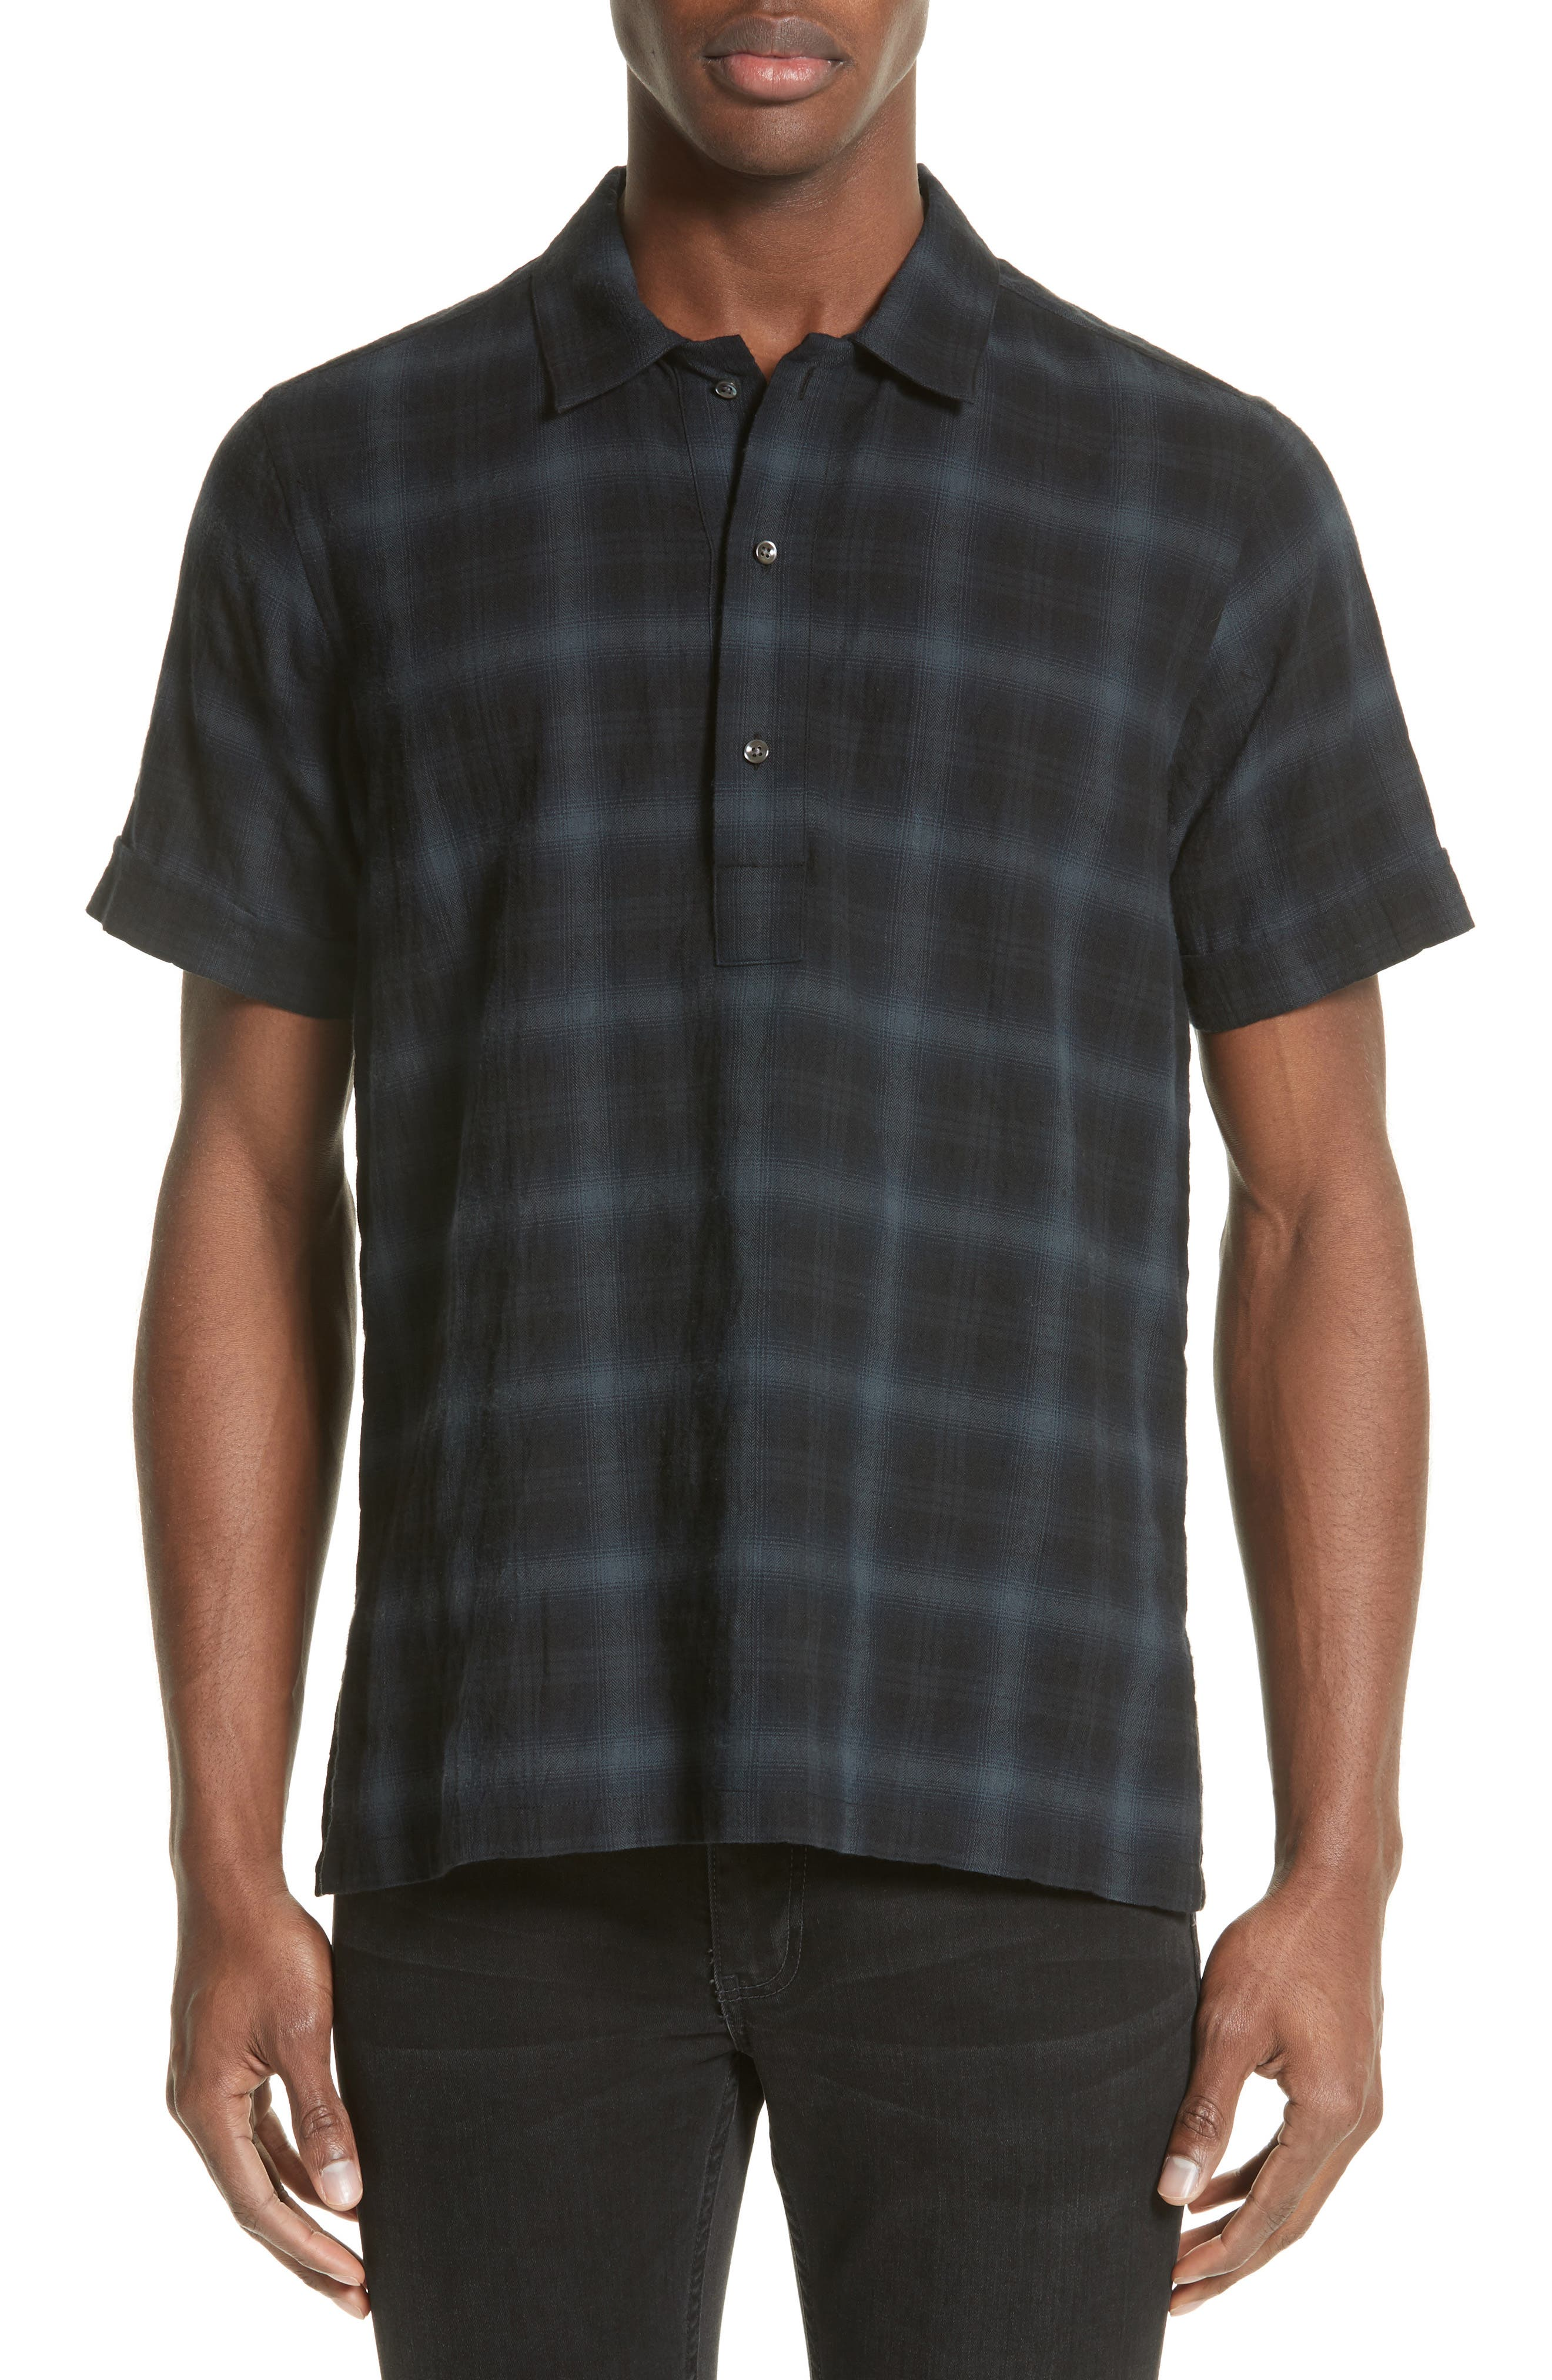 Main Image - OVADIA & SONS Ashkelon Polo Shirt